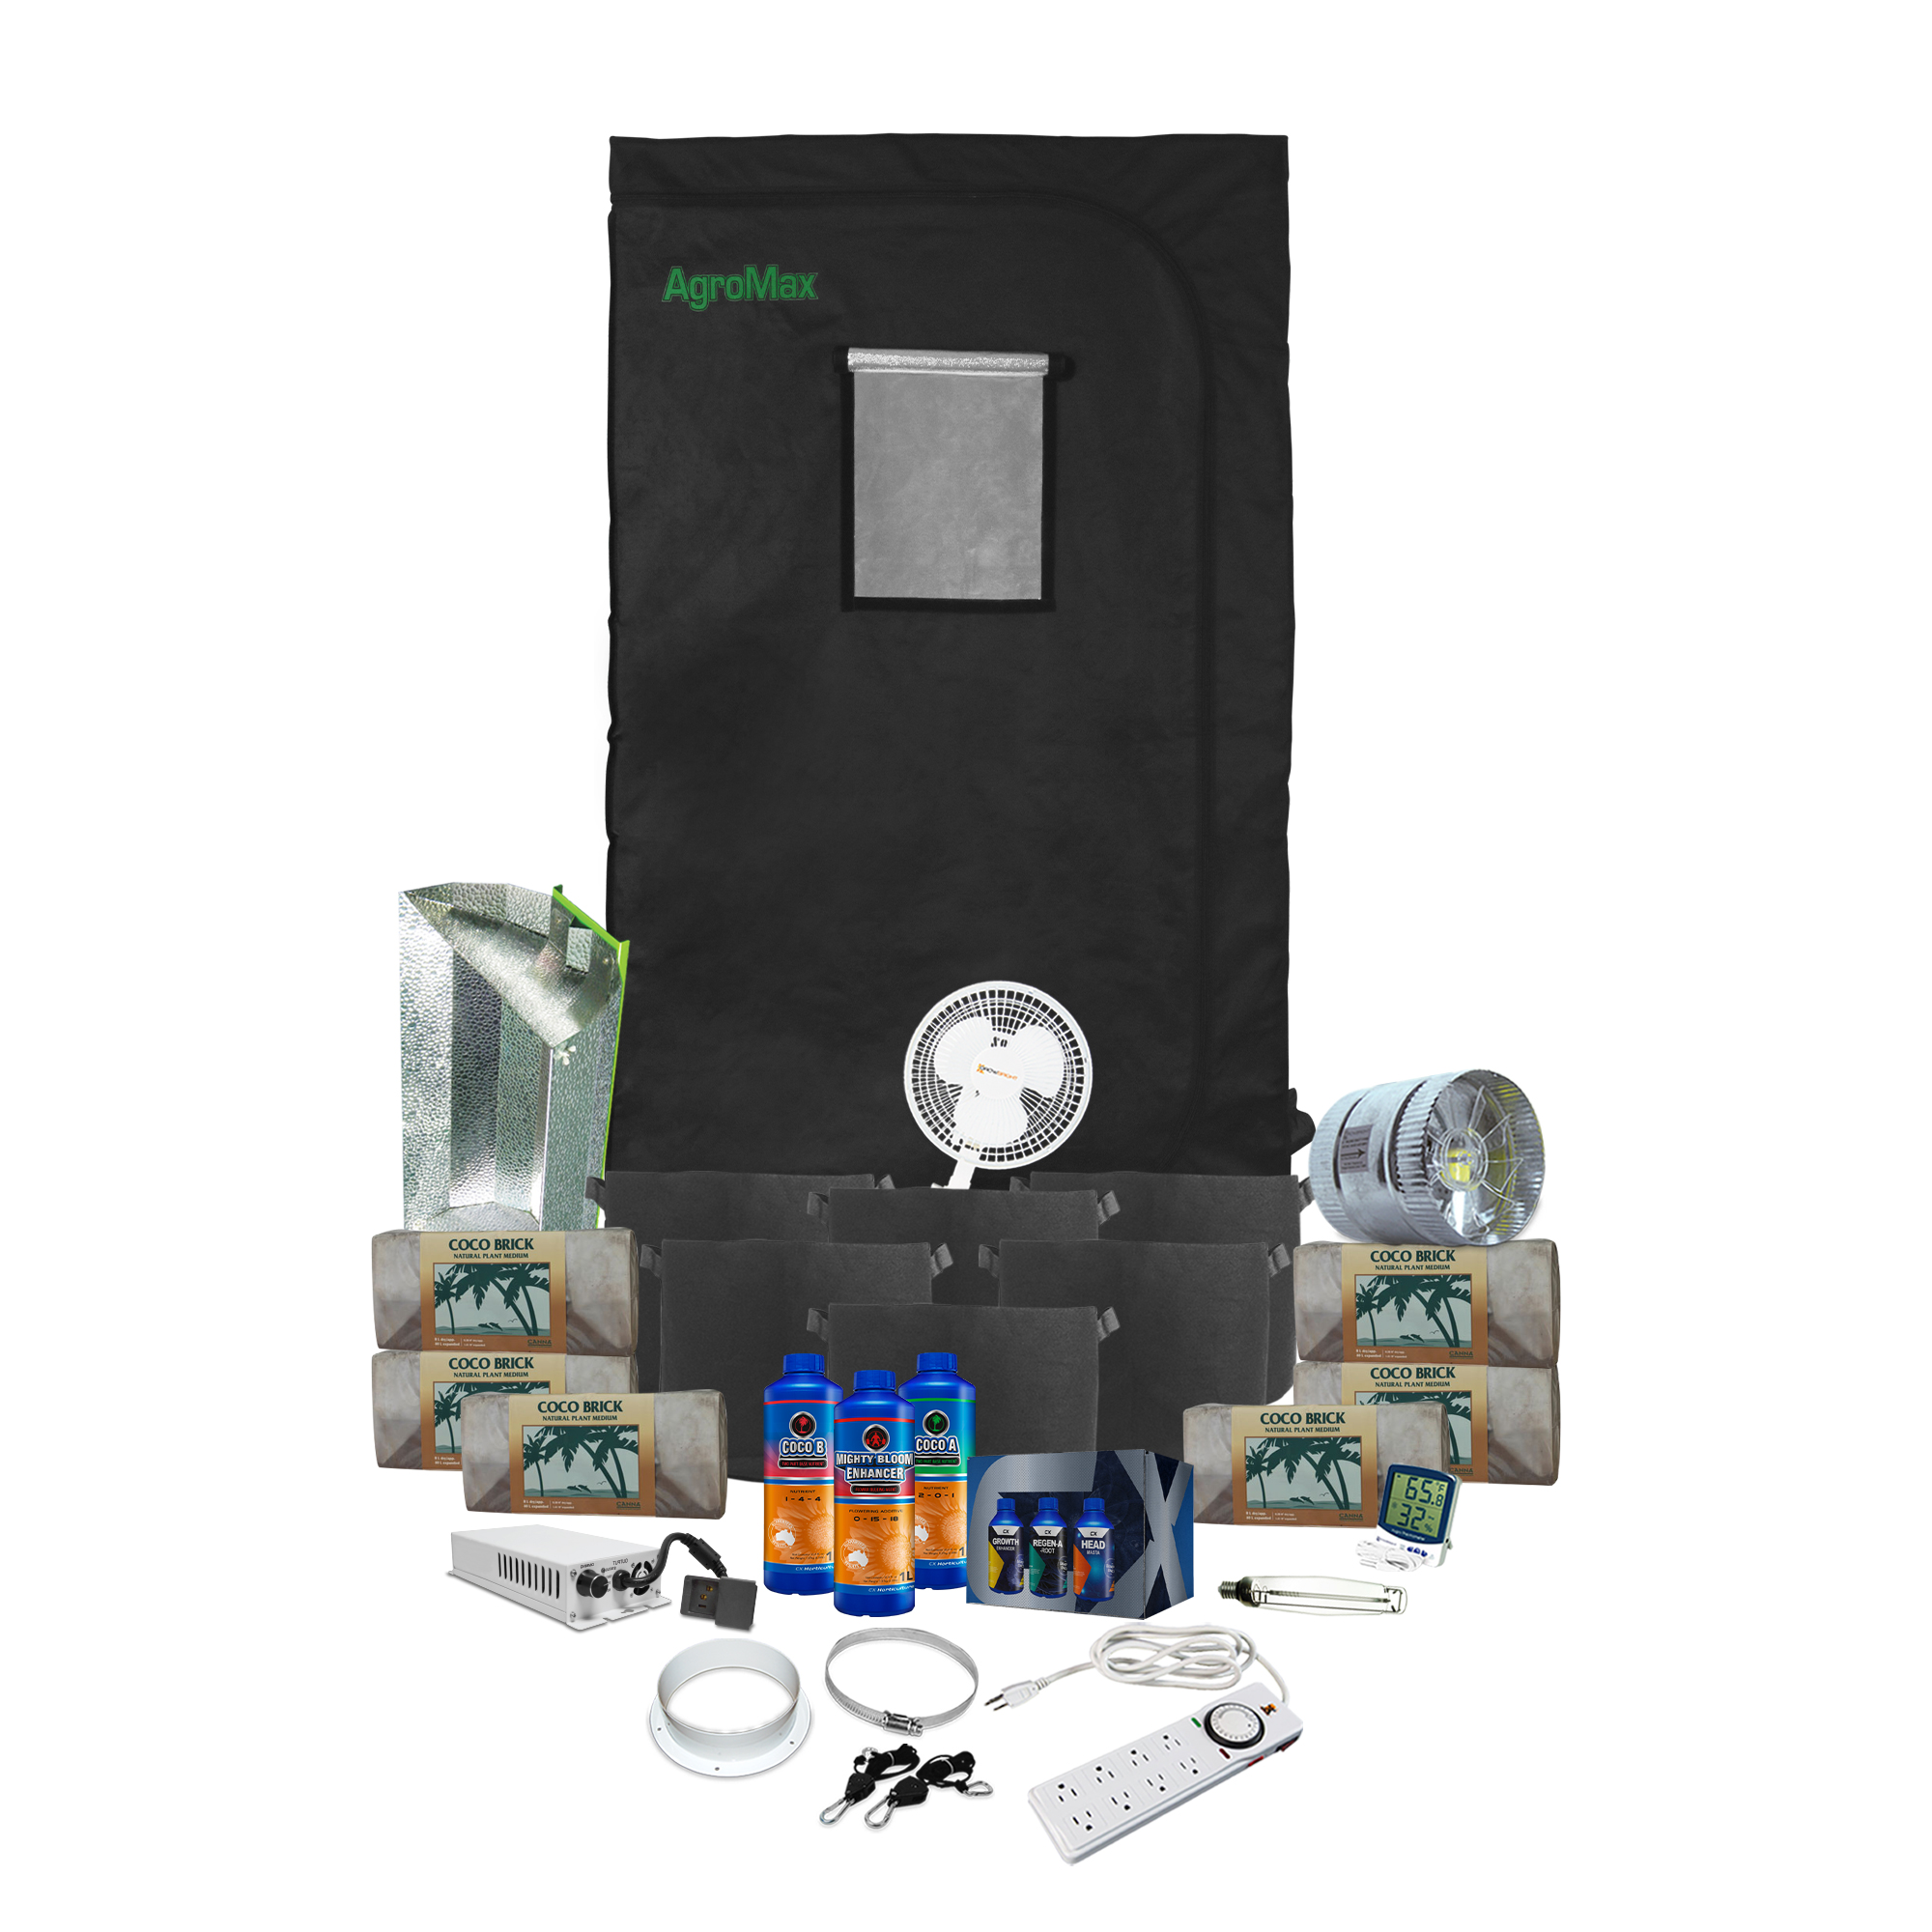 HTG Original 3'x3' Hydroponic LED Grow Tent Kit